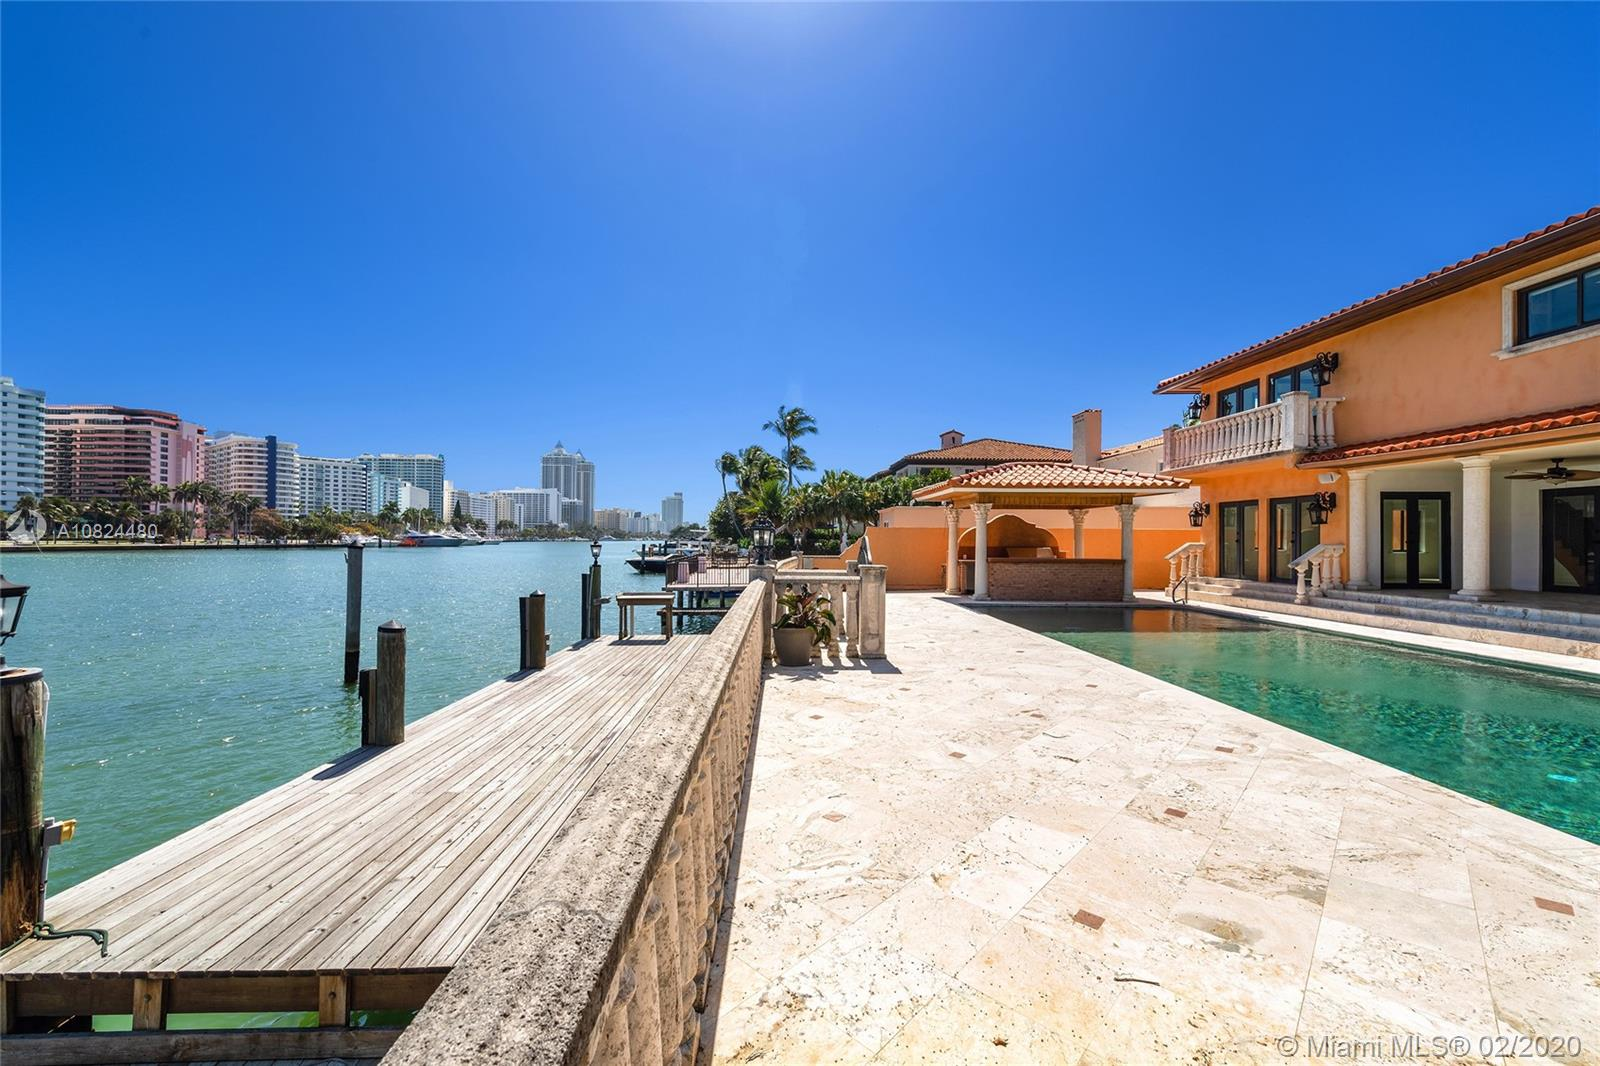 5445 Pine Tree Dr, Miami Beach FL 33140